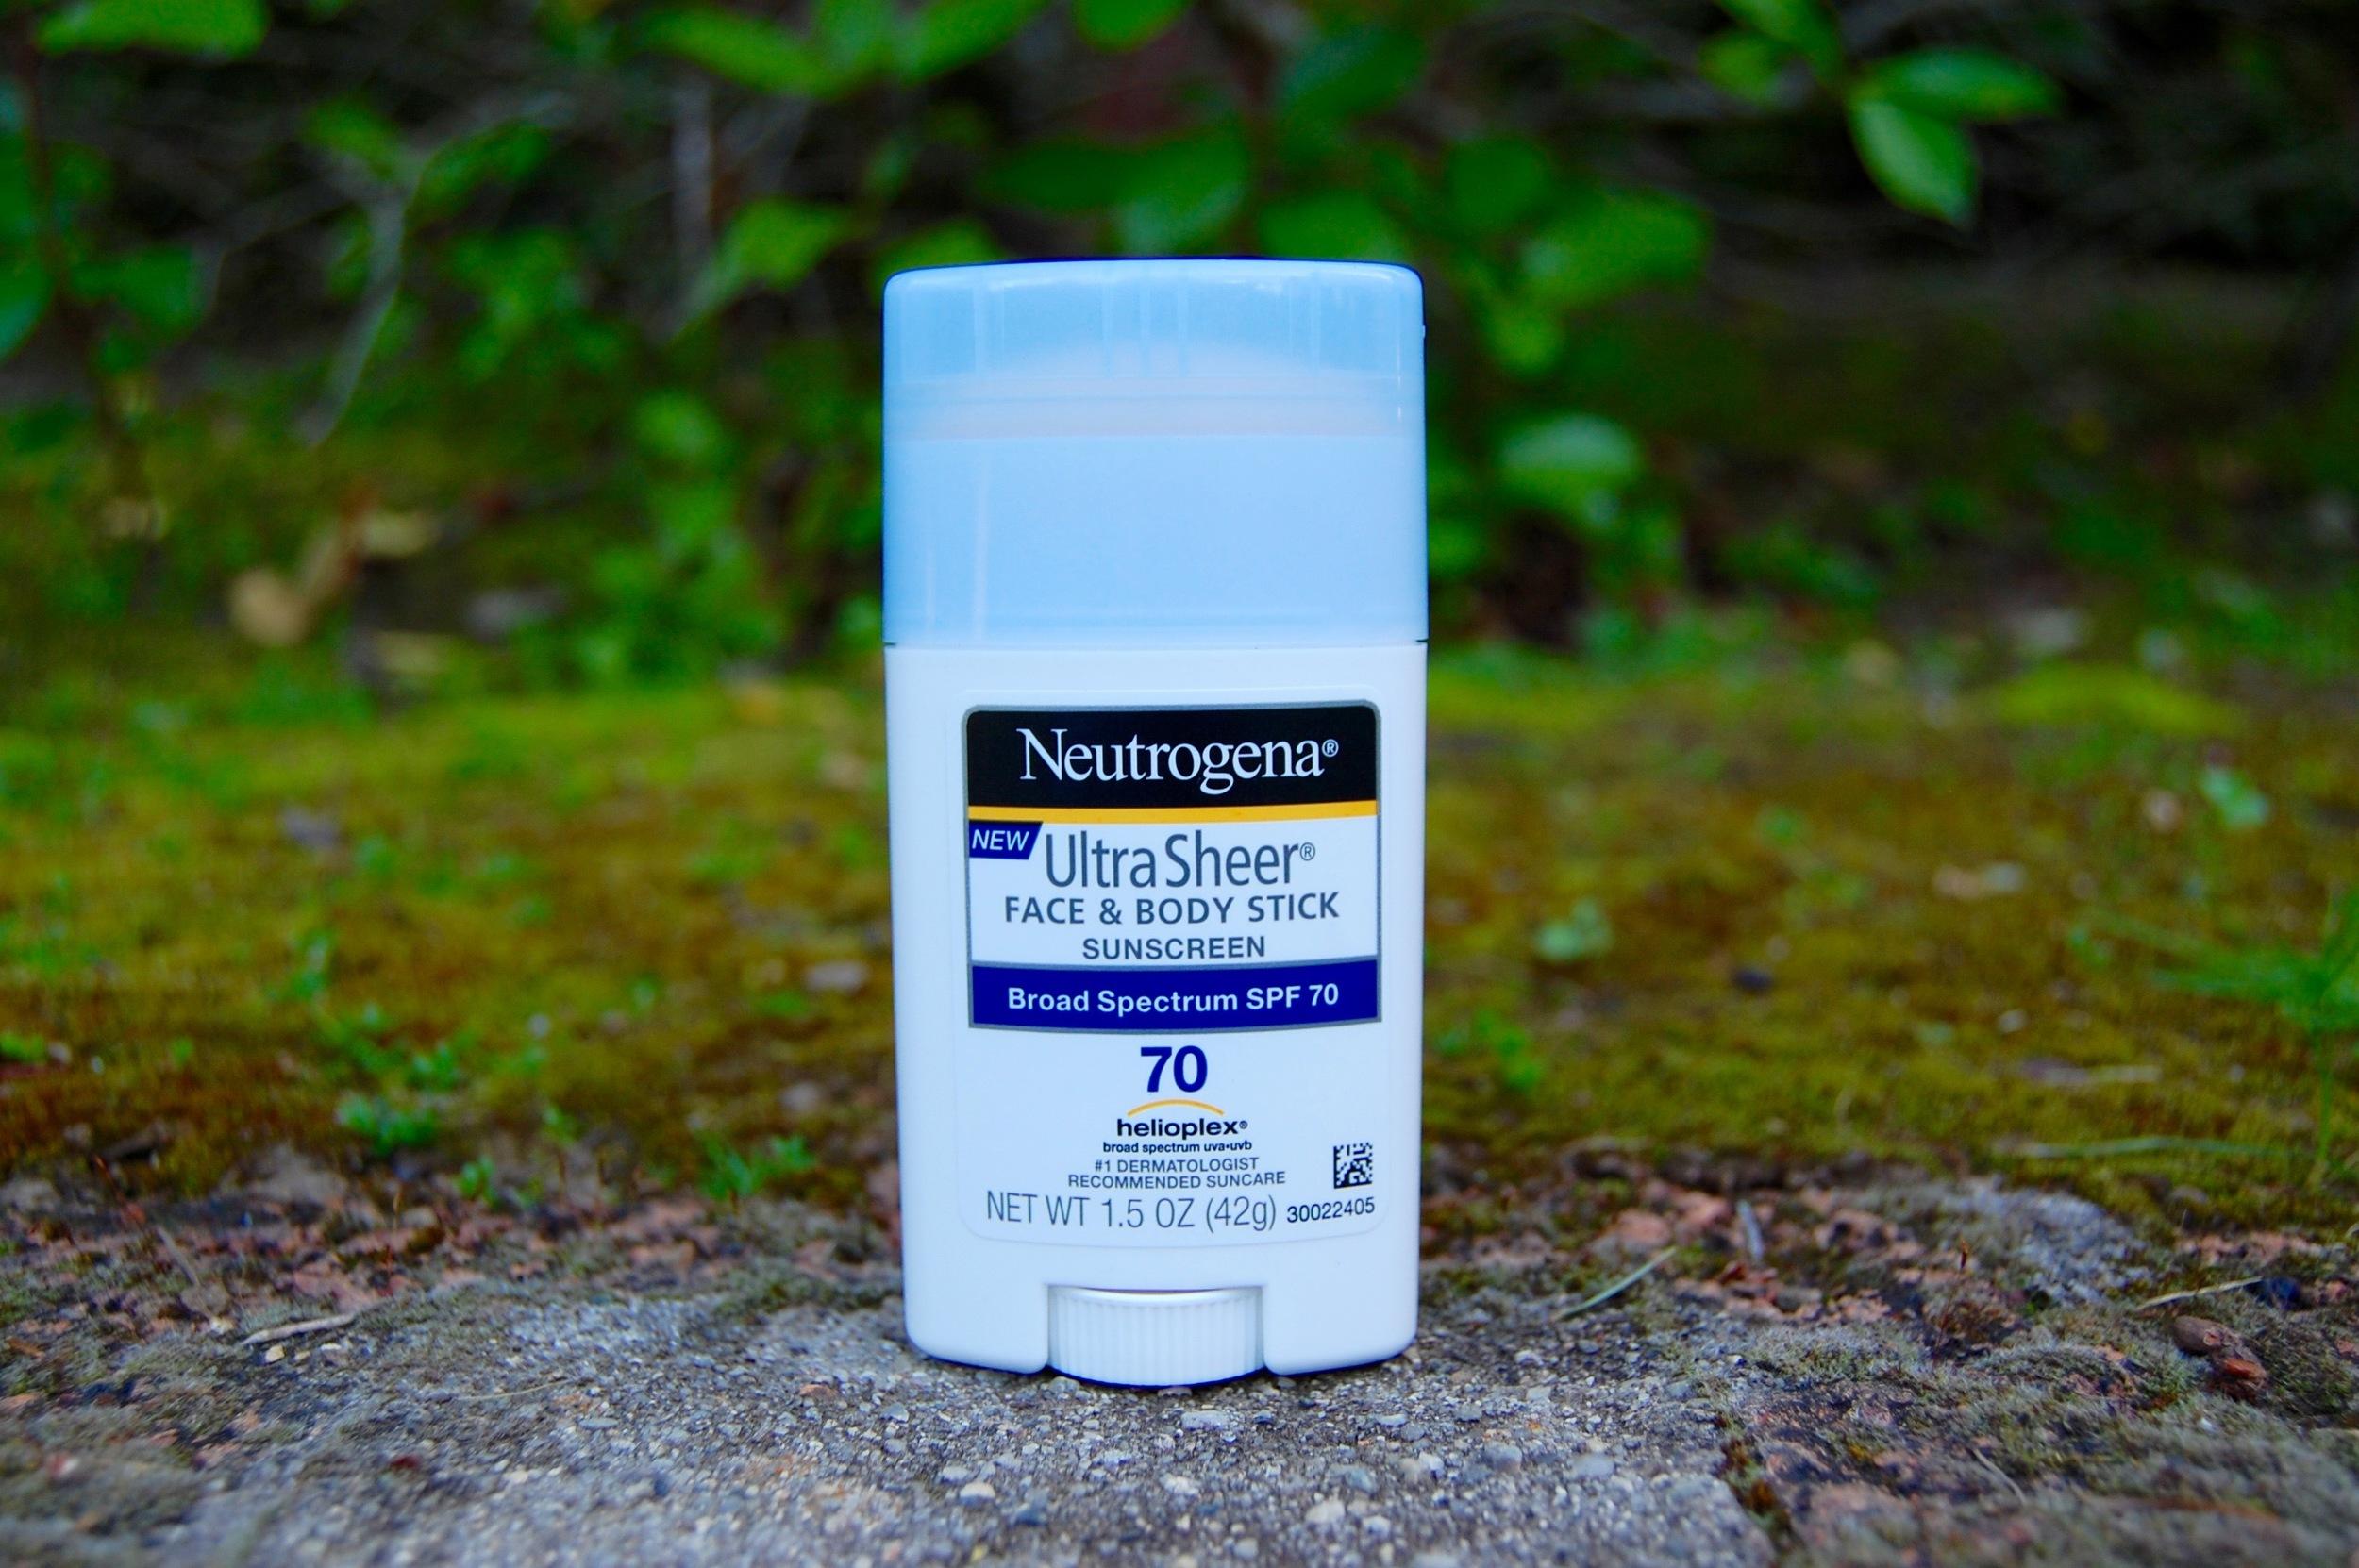 Neutrogena Sunscreen Ultra Sheer Face & Body Stick SPF 70